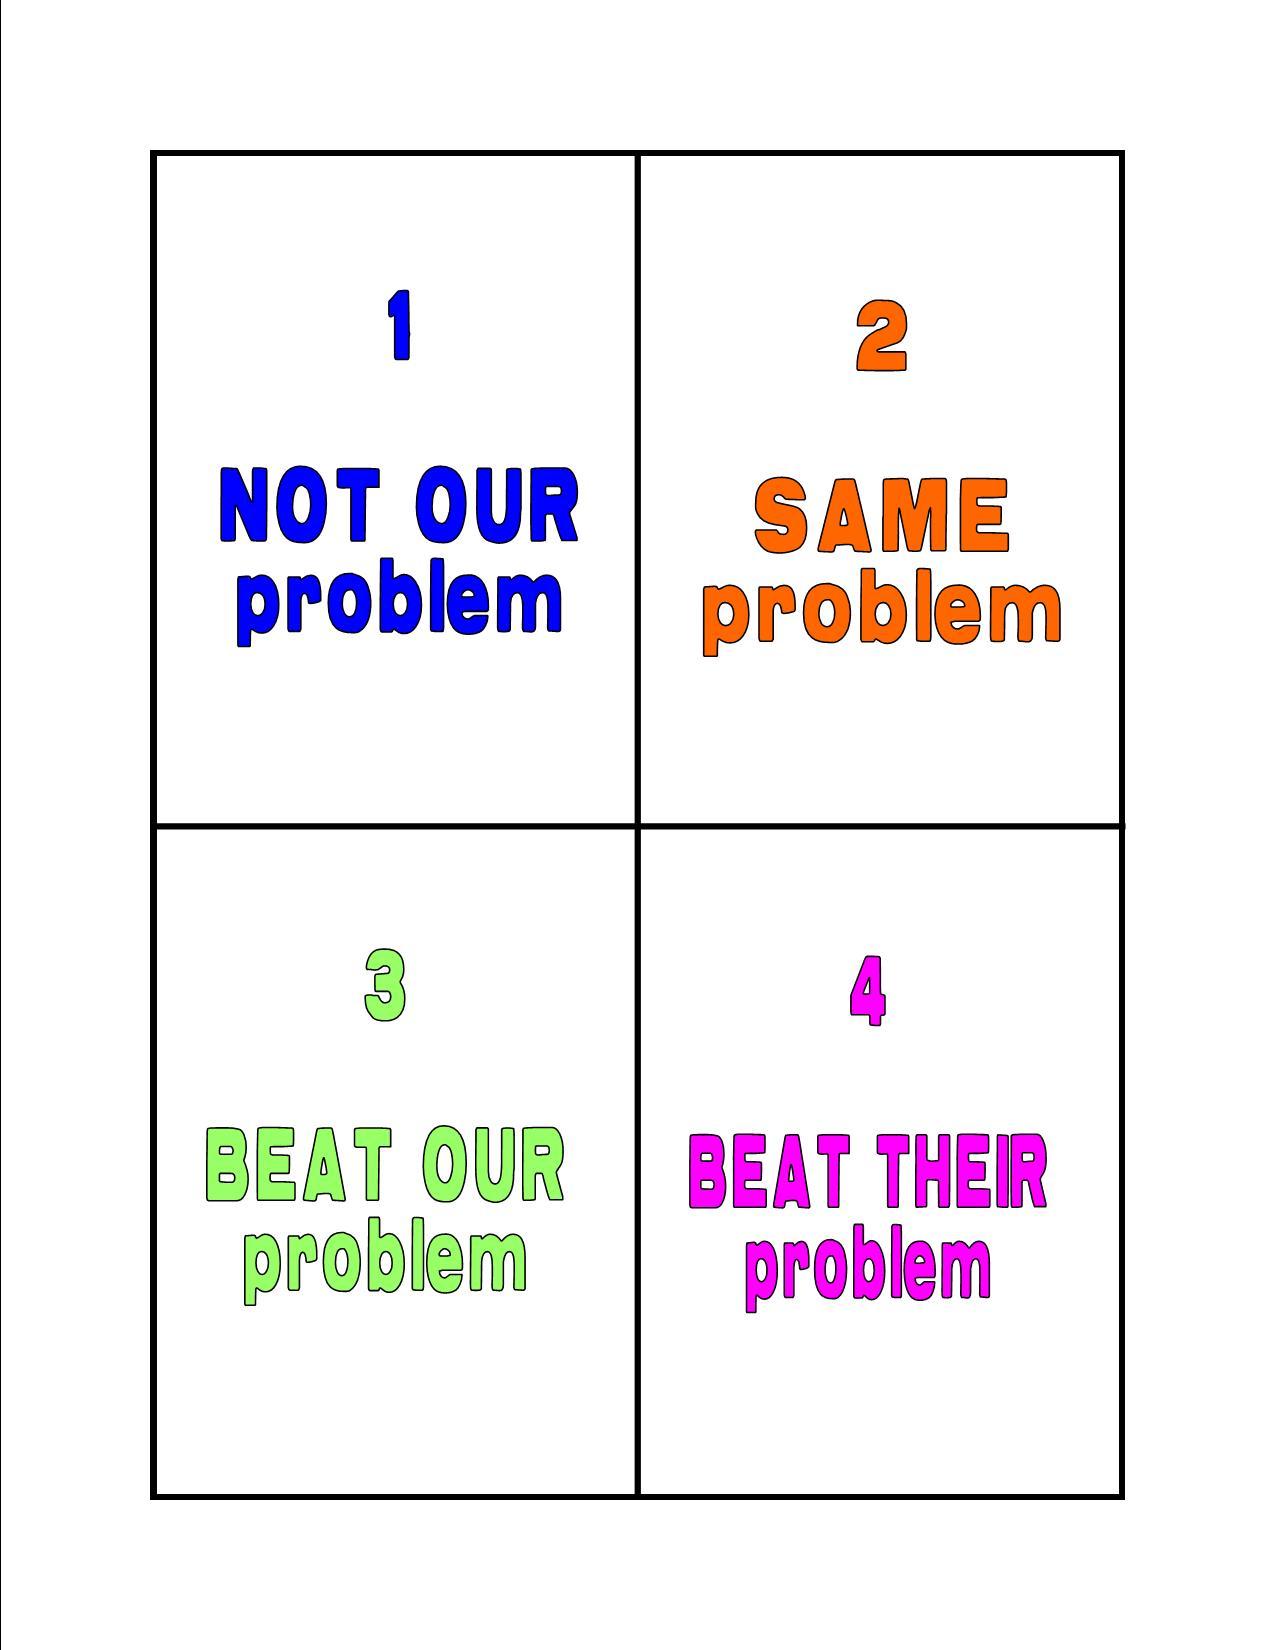 4_quad_of_probles.jpg